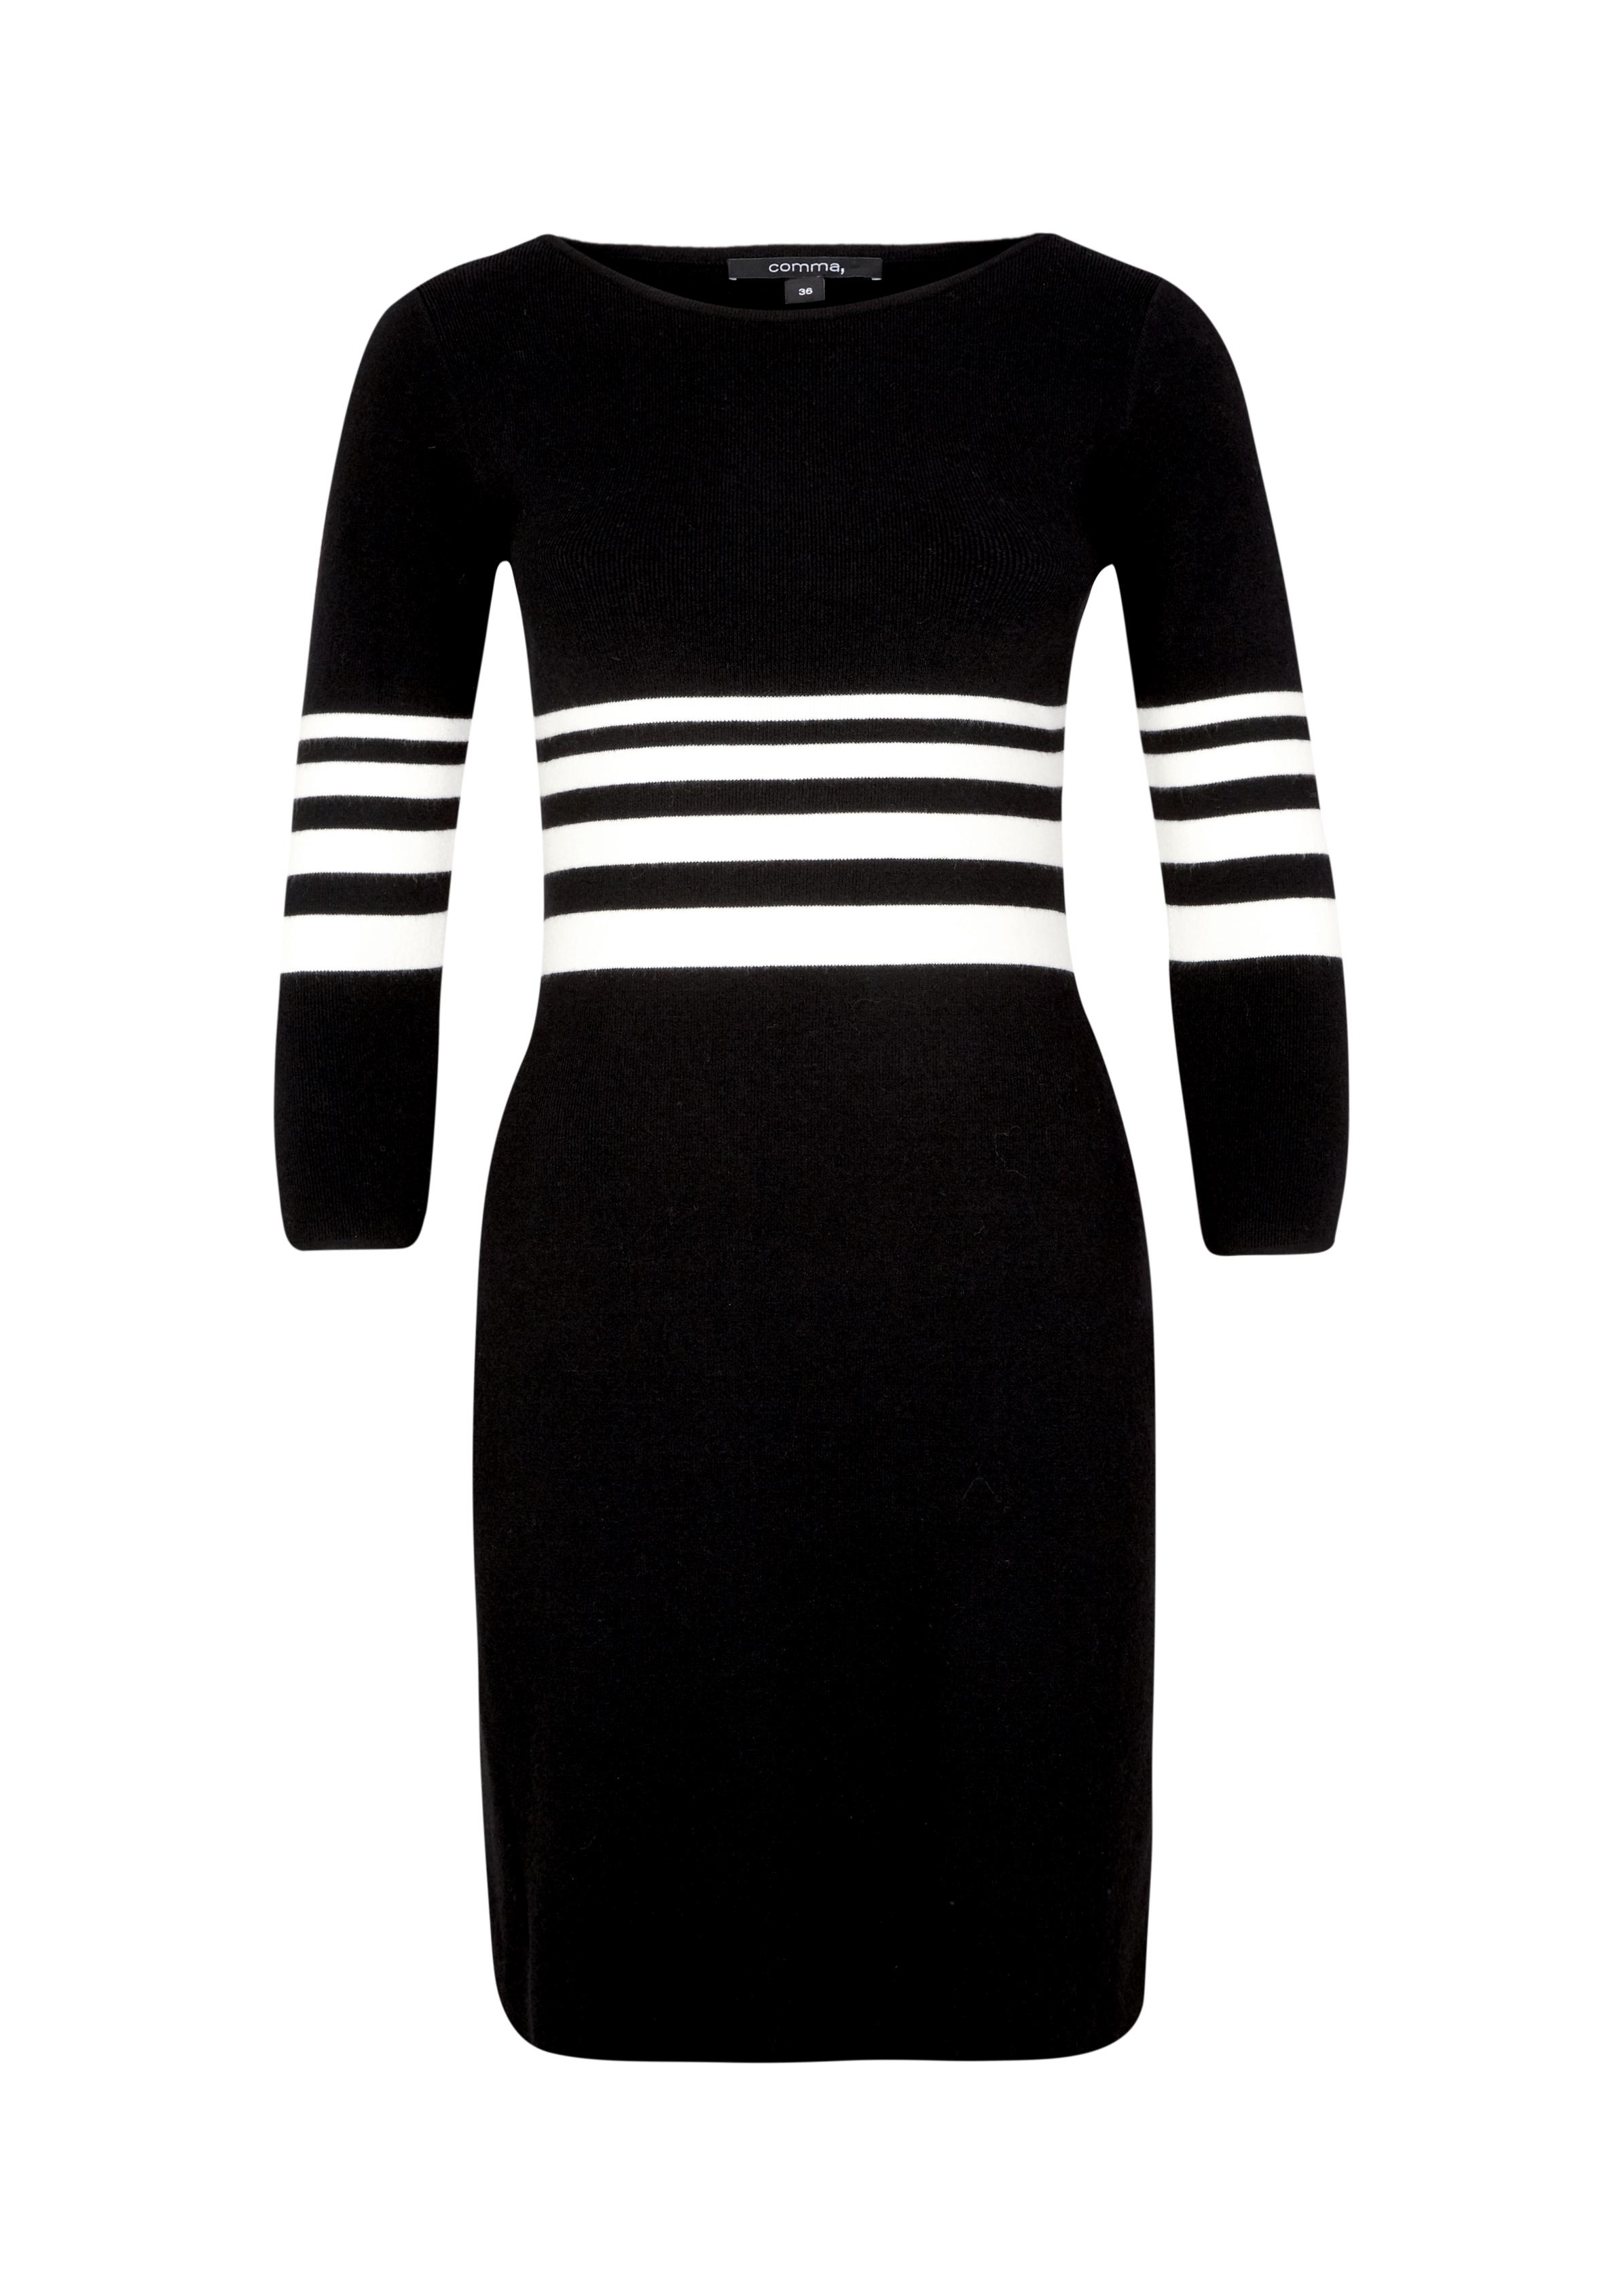 Strickkleid | Bekleidung > Kleider > Strickkleider | Grau/schwarz | 51% vikose -  29% polyester -  20% nylon | comma